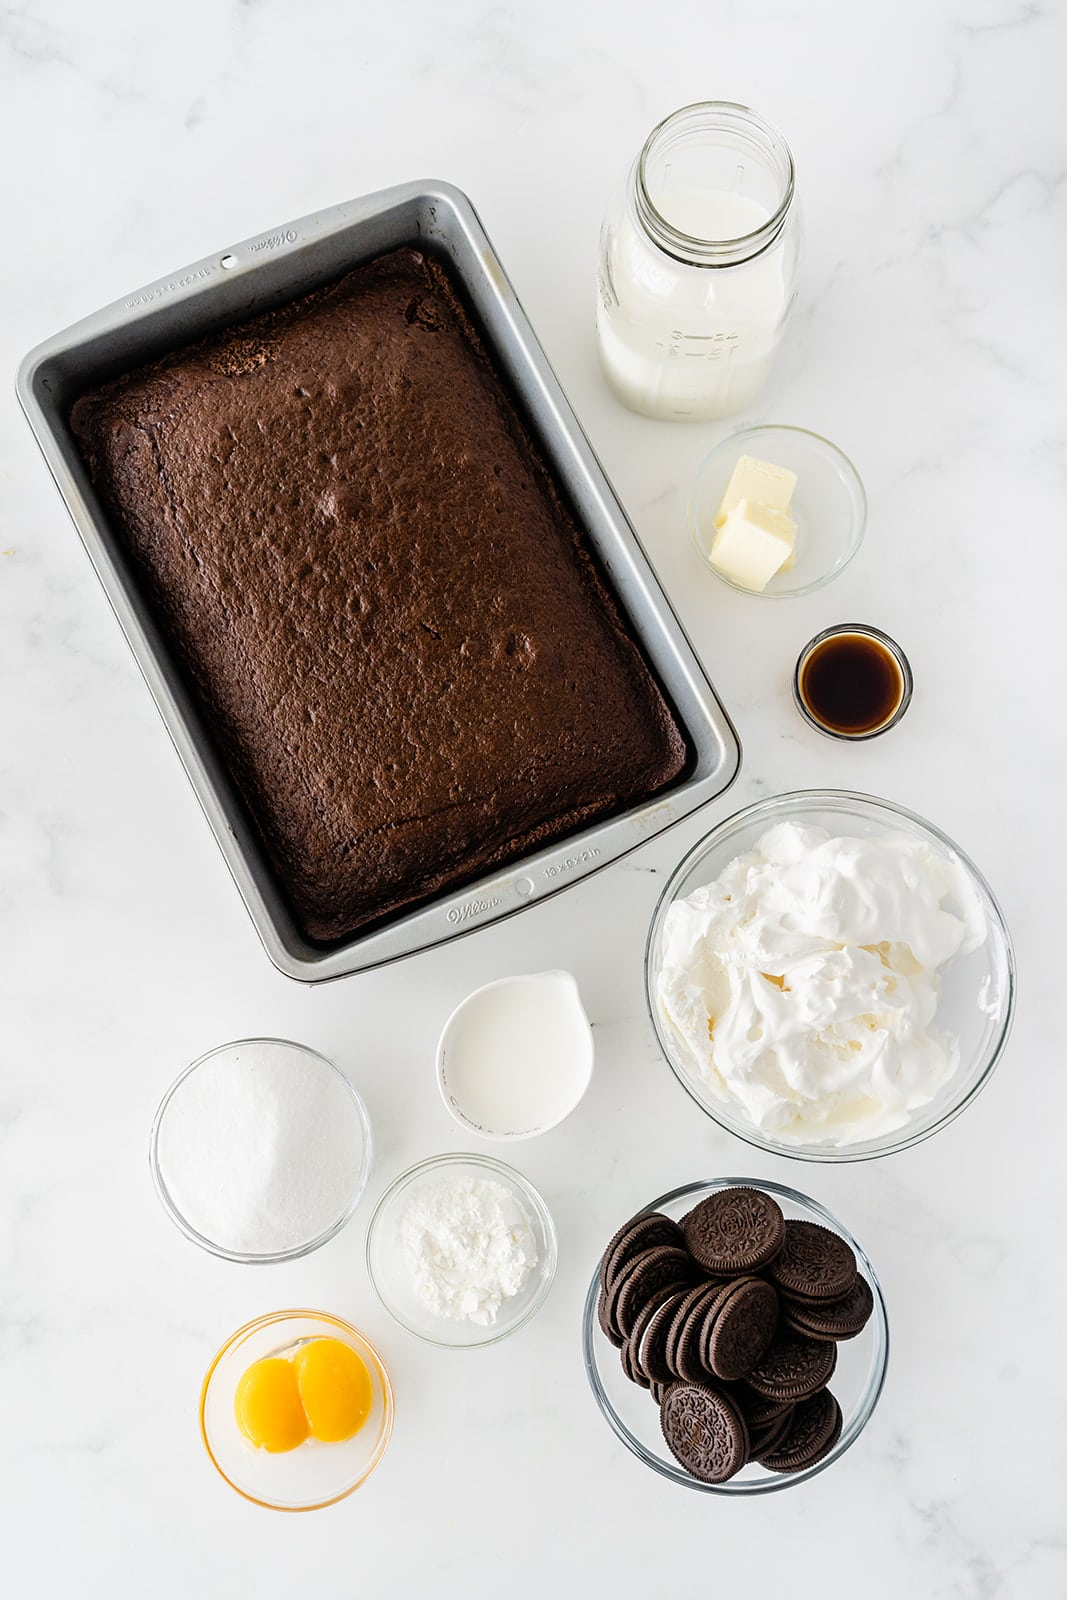 ingredients needed to make Oreo poke cake